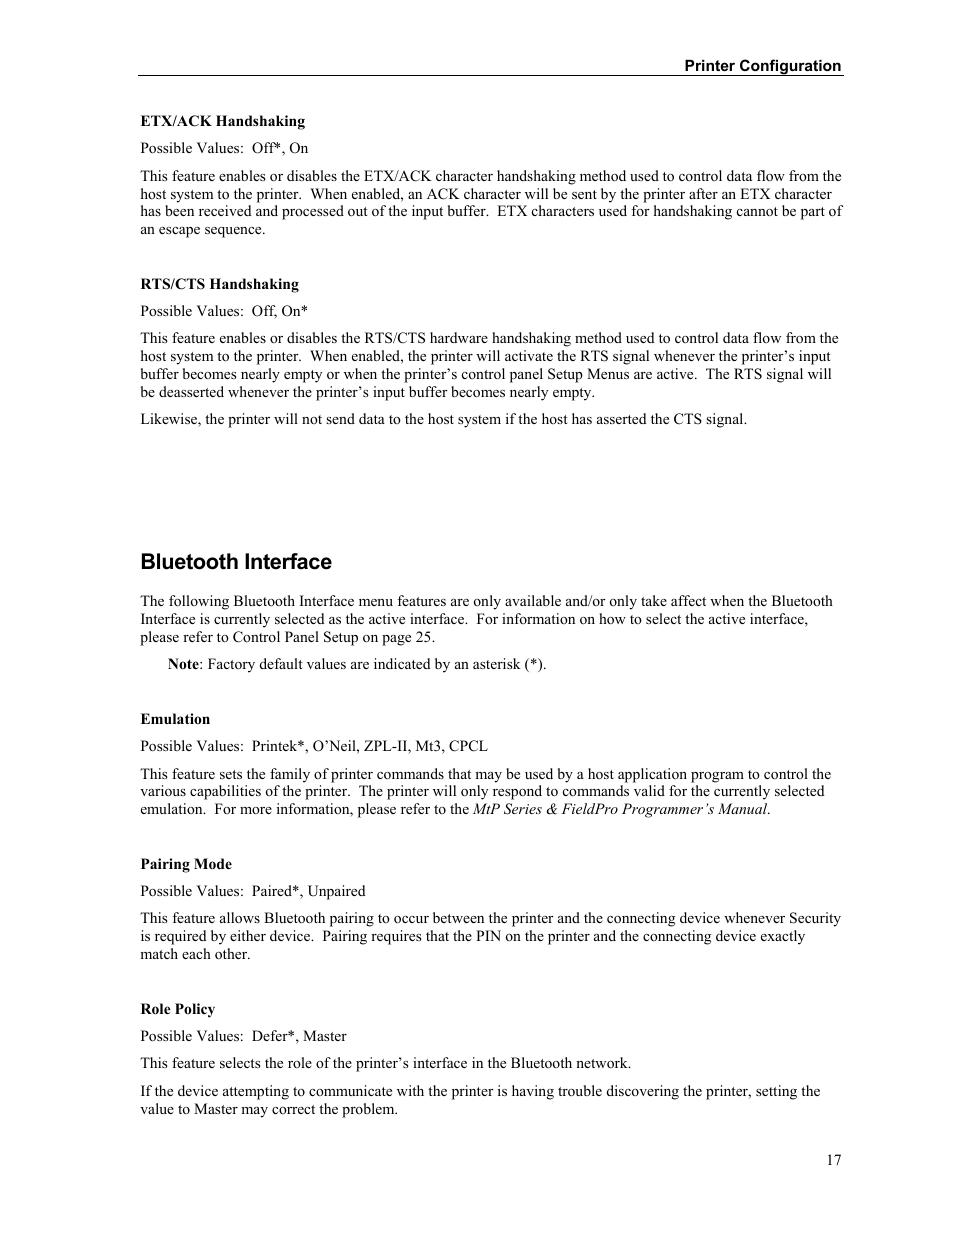 Bluetooth interface | Printek FieldPro RT43 User Manual